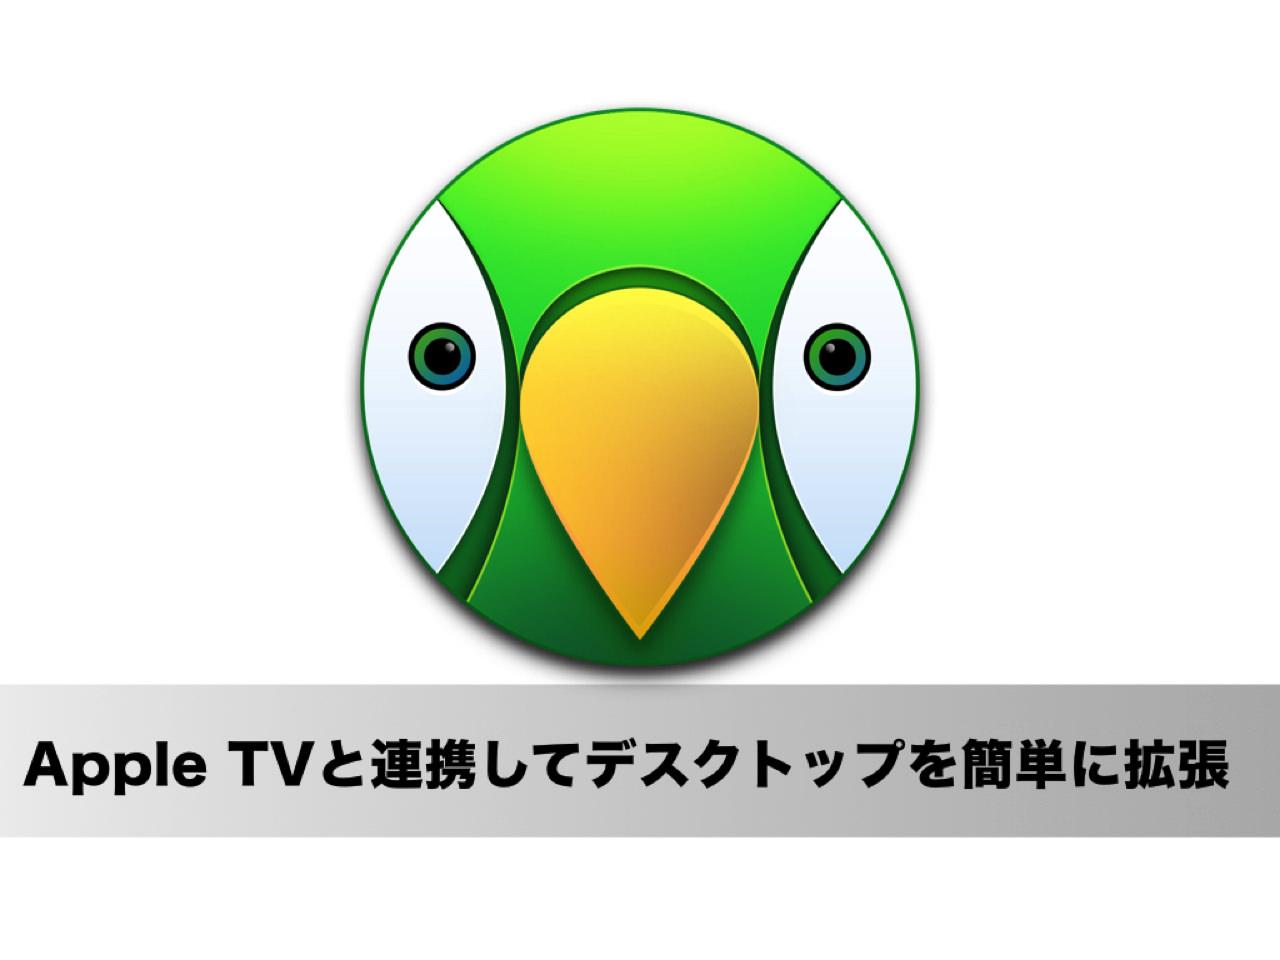 Apple TV(第4世代)の使い方:初期設定(セットアップ)の方法